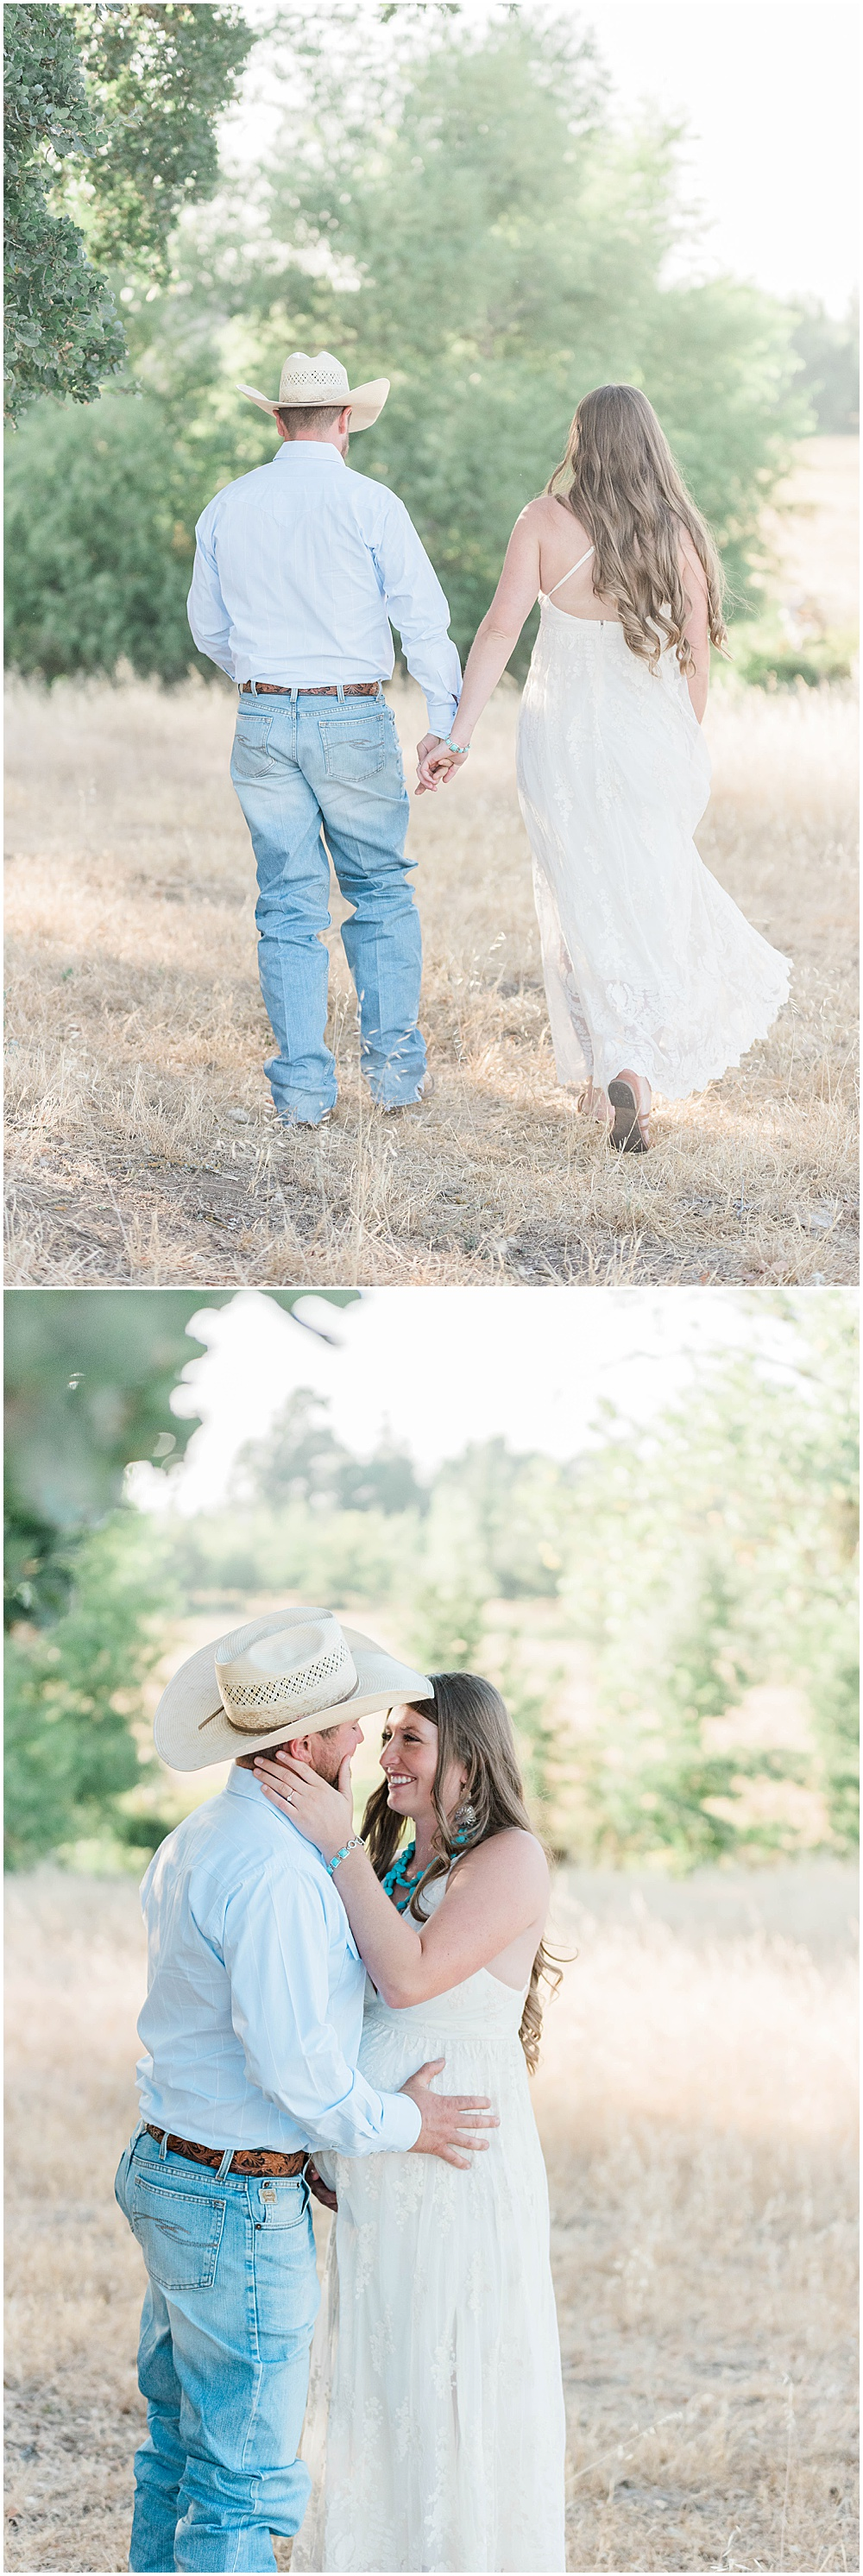 Samantha McPherrin Photography-Chico Wedding Photographer_0079.jpg